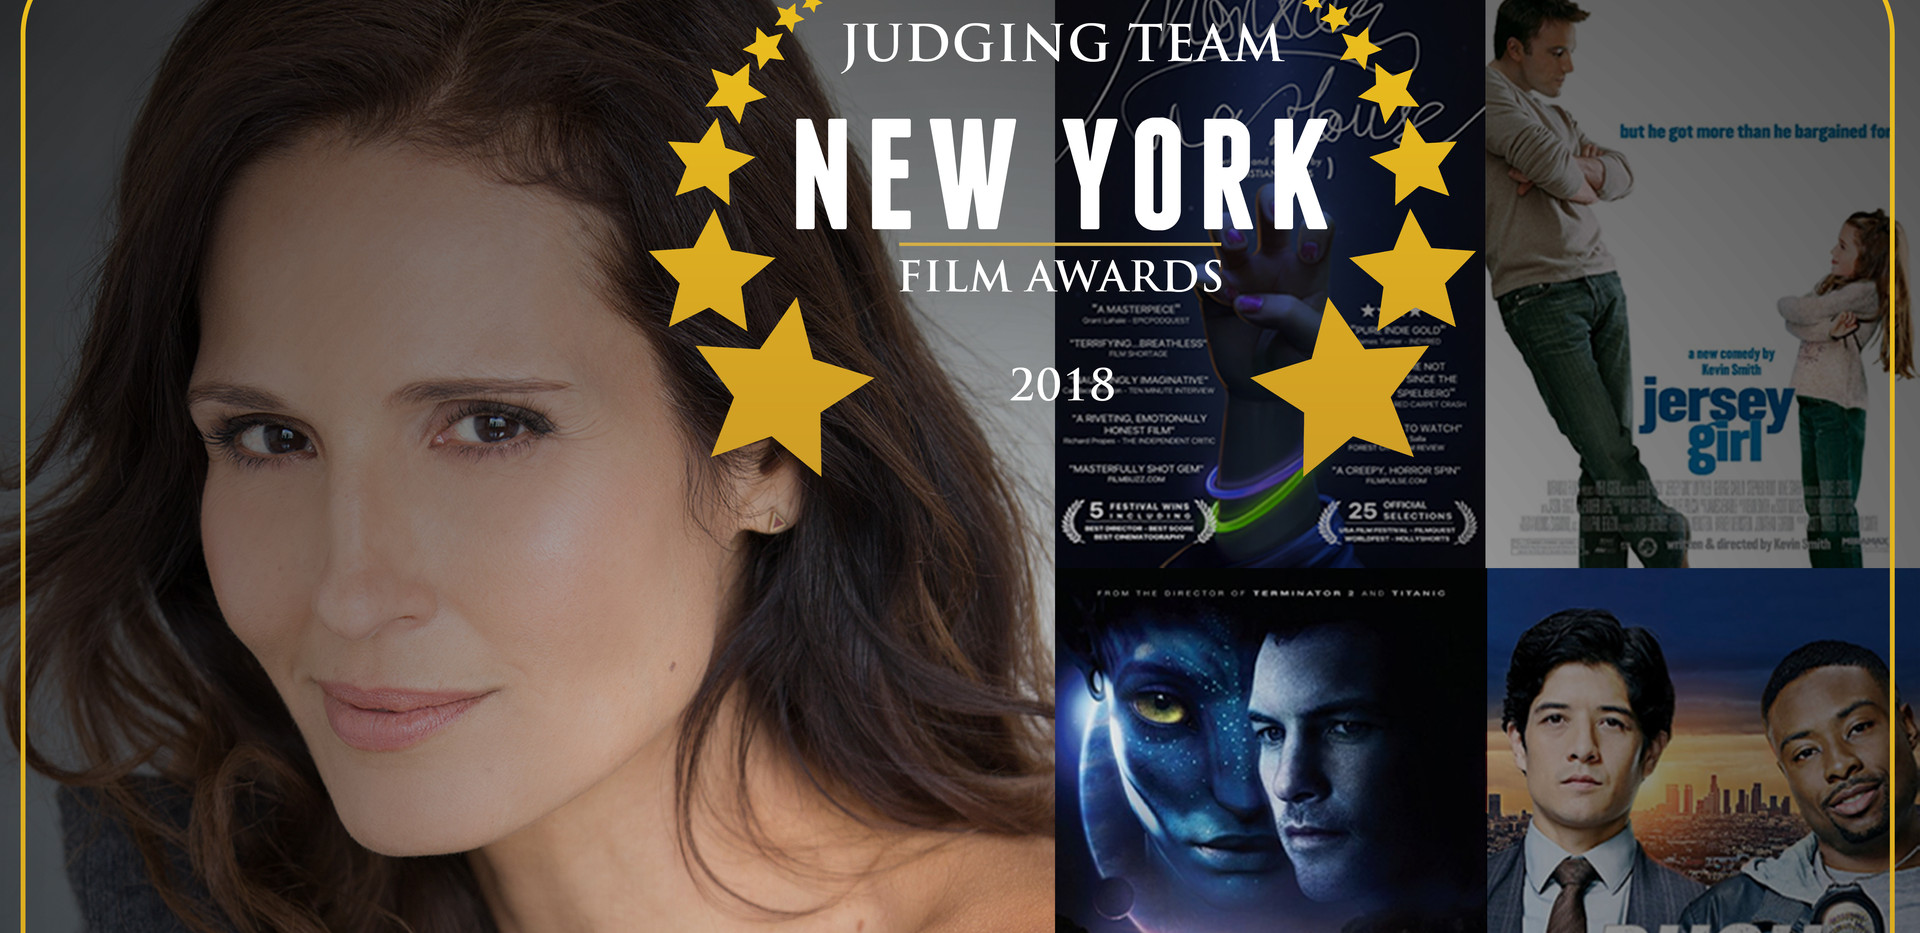 New York Film Awards 2018 Annual Lisa Ro